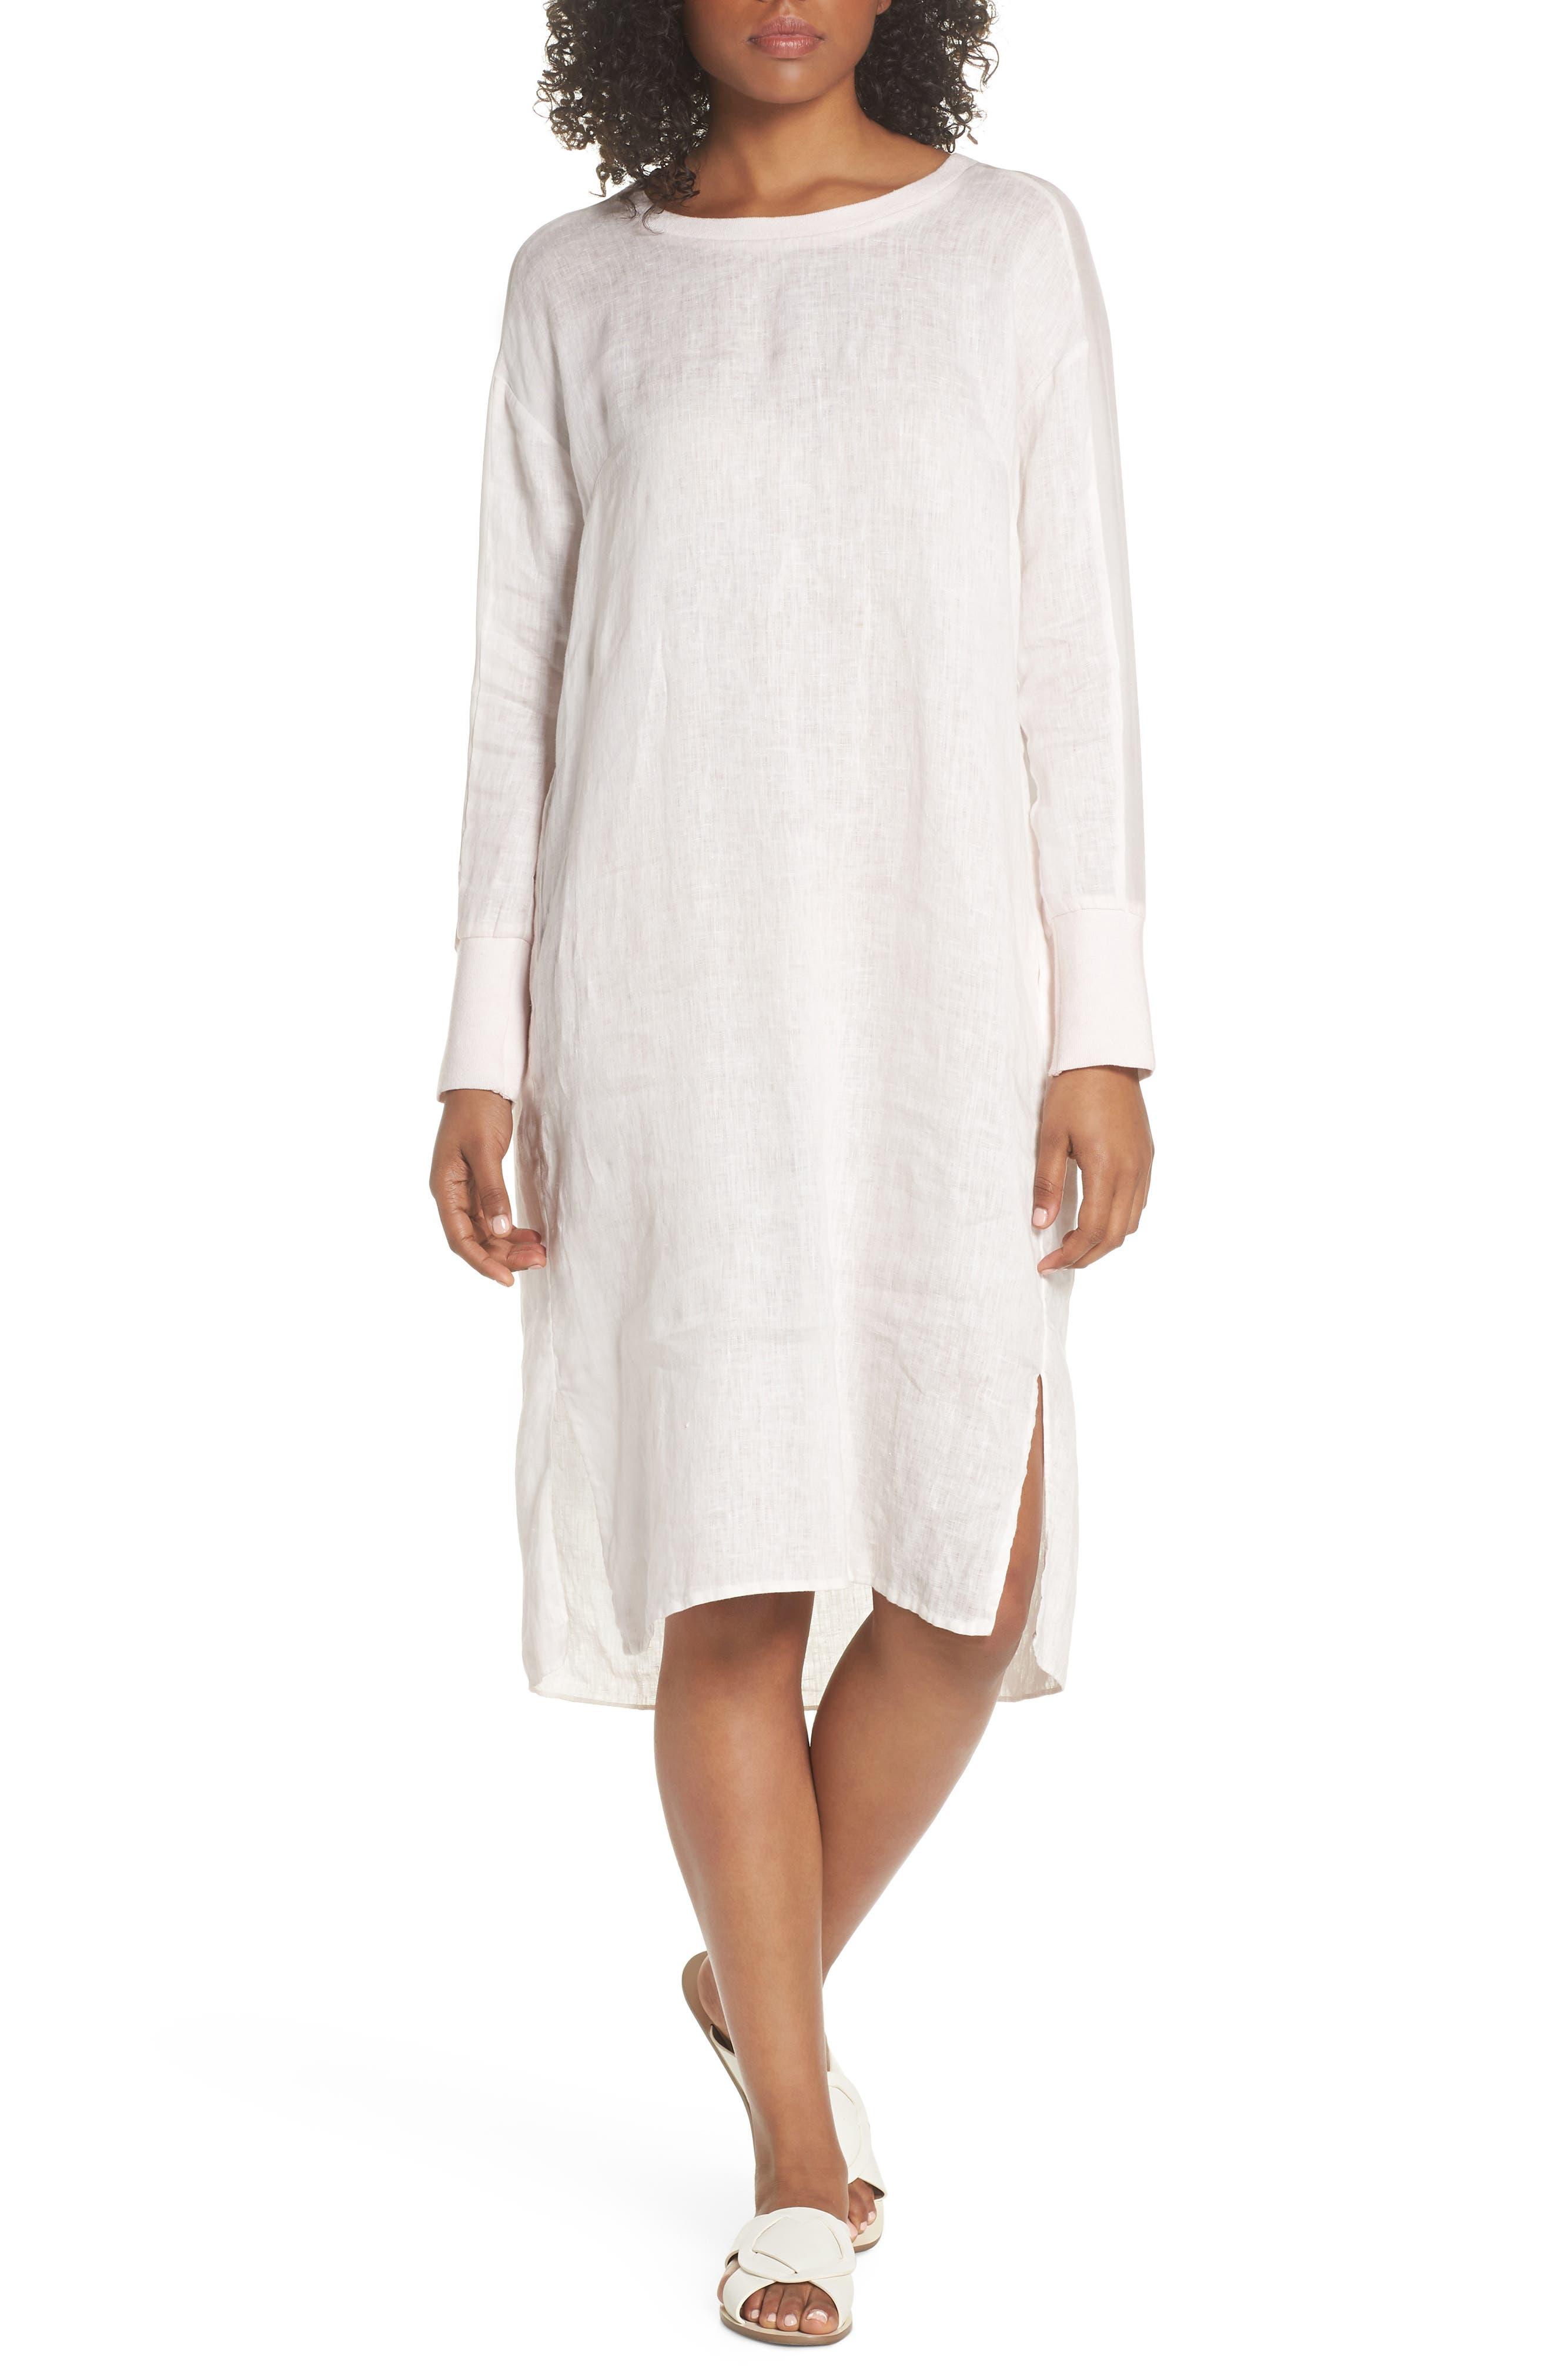 Rata Linen Shift Dress,                             Alternate thumbnail 6, color,                             680